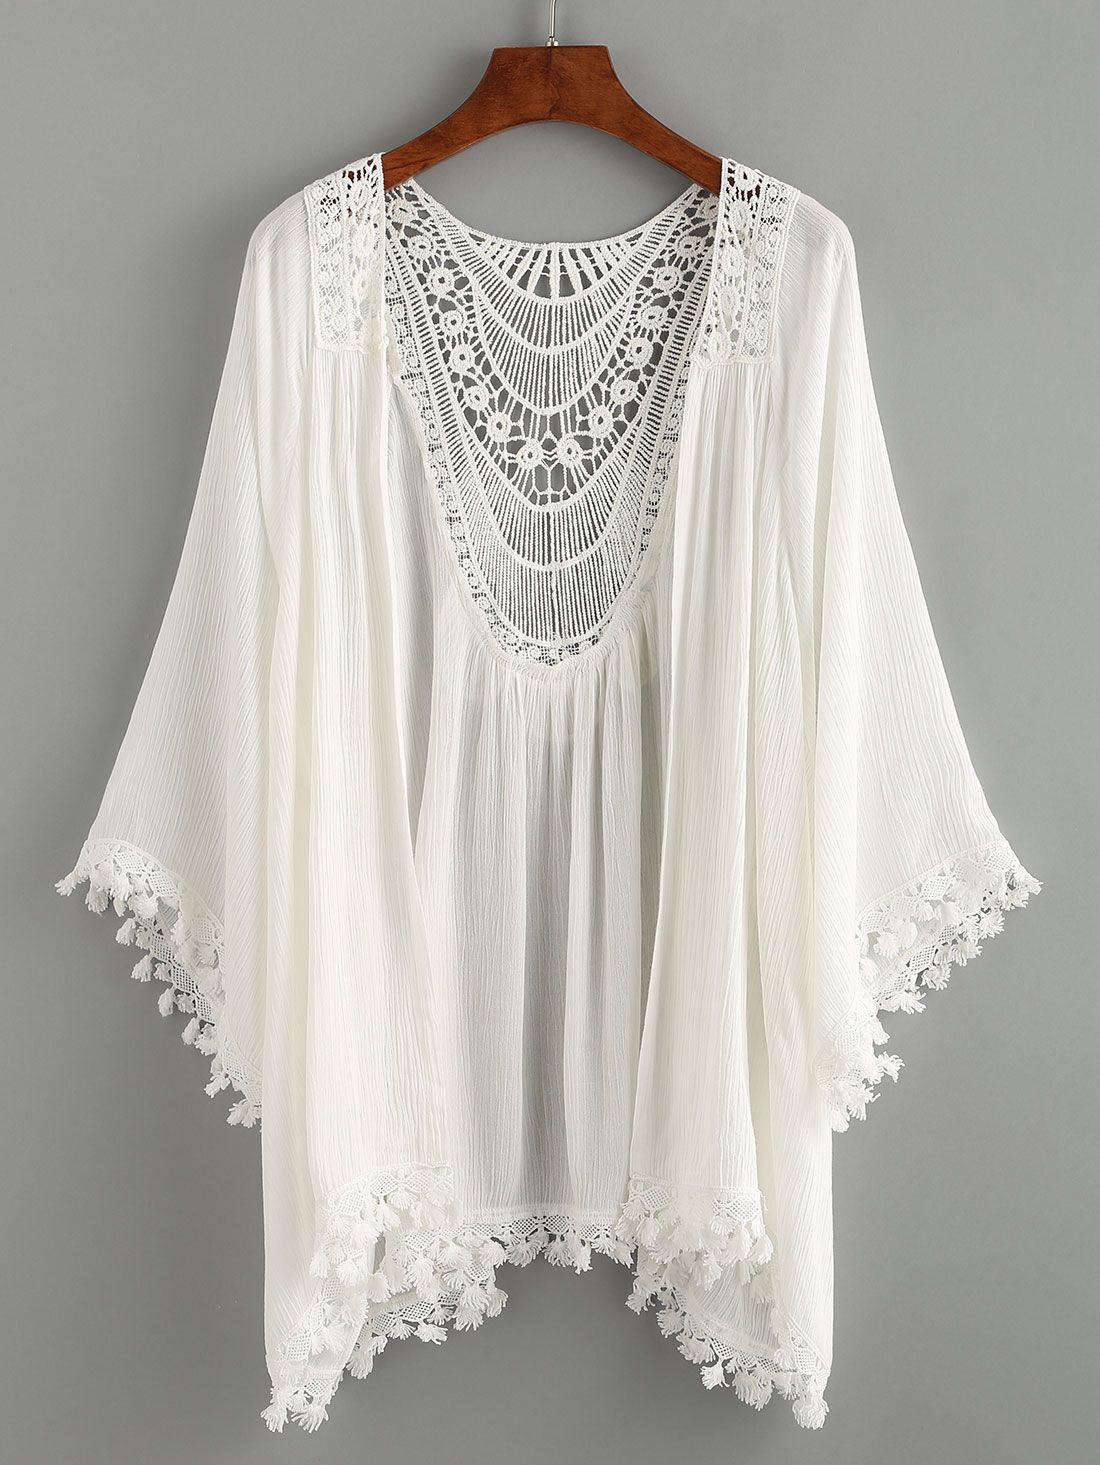 Blanco sheinside Shein De Ribete Encaje Spanish Crochet Kimono xwHqITz1W